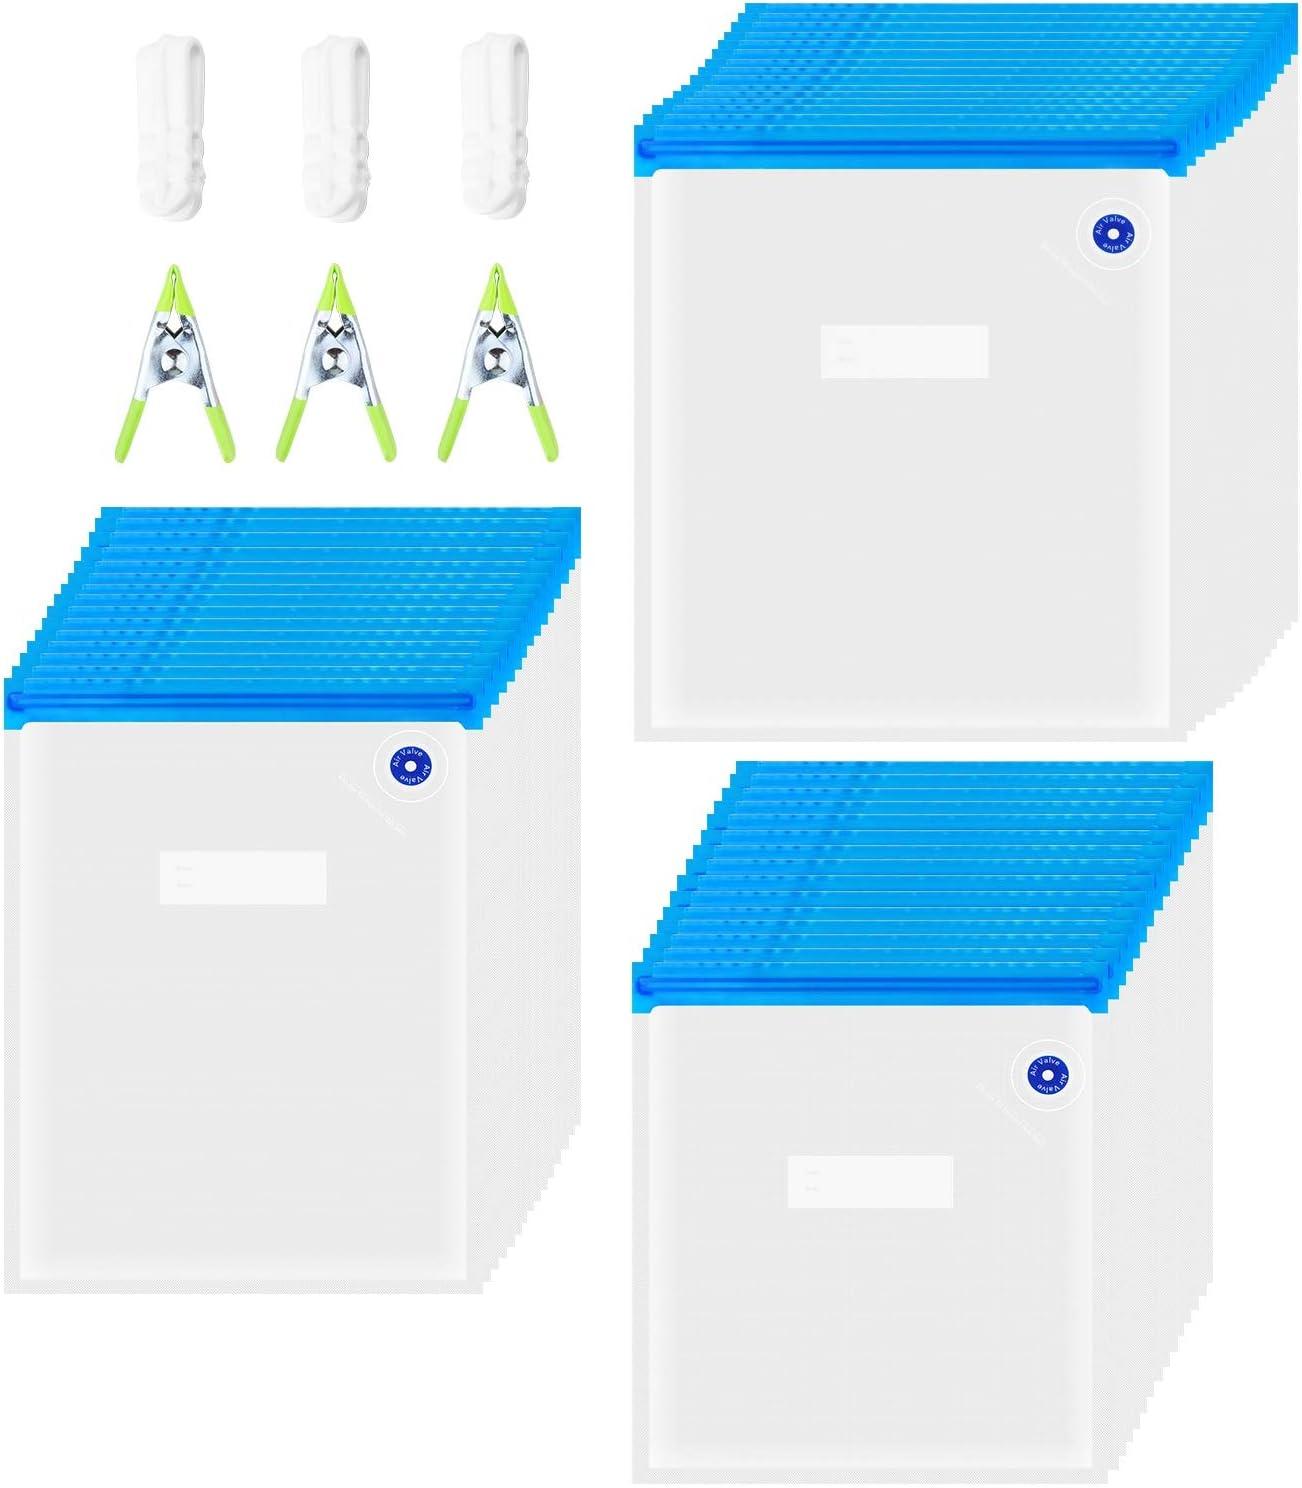 ZEROLISM Sous Vide Bags, 45 Reusable BPA Free Food Vacuum Sealer Bags,3 Sizes of Vacuum Zipper Bags,3 sealing clips, 3 sous vide bag clips, for Food Storage,Food Preservation,Joule Cookers and Anova